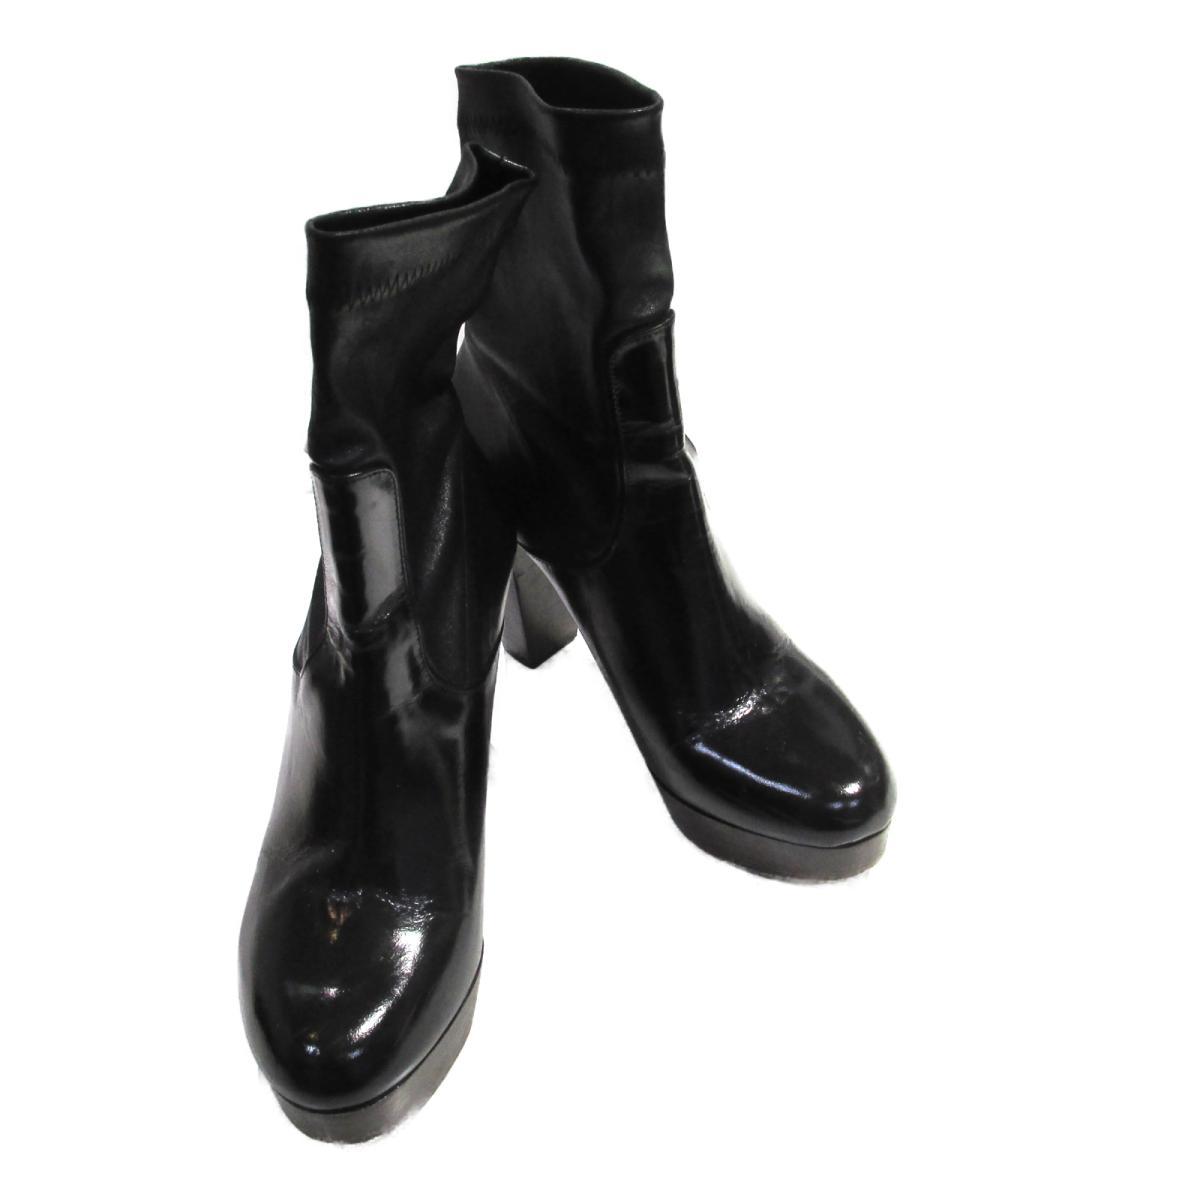 SELECTION Roberto Clergerie ショートブーツ その他 ランクB ブランドオフ 誕生日 プレゼント ギフト セレクション レザー 毎日続々入荷 シューズ ブラック 靴 レディース クツ BRANDOFF 中古 海外並行輸入正規品 ブーツ ブランド